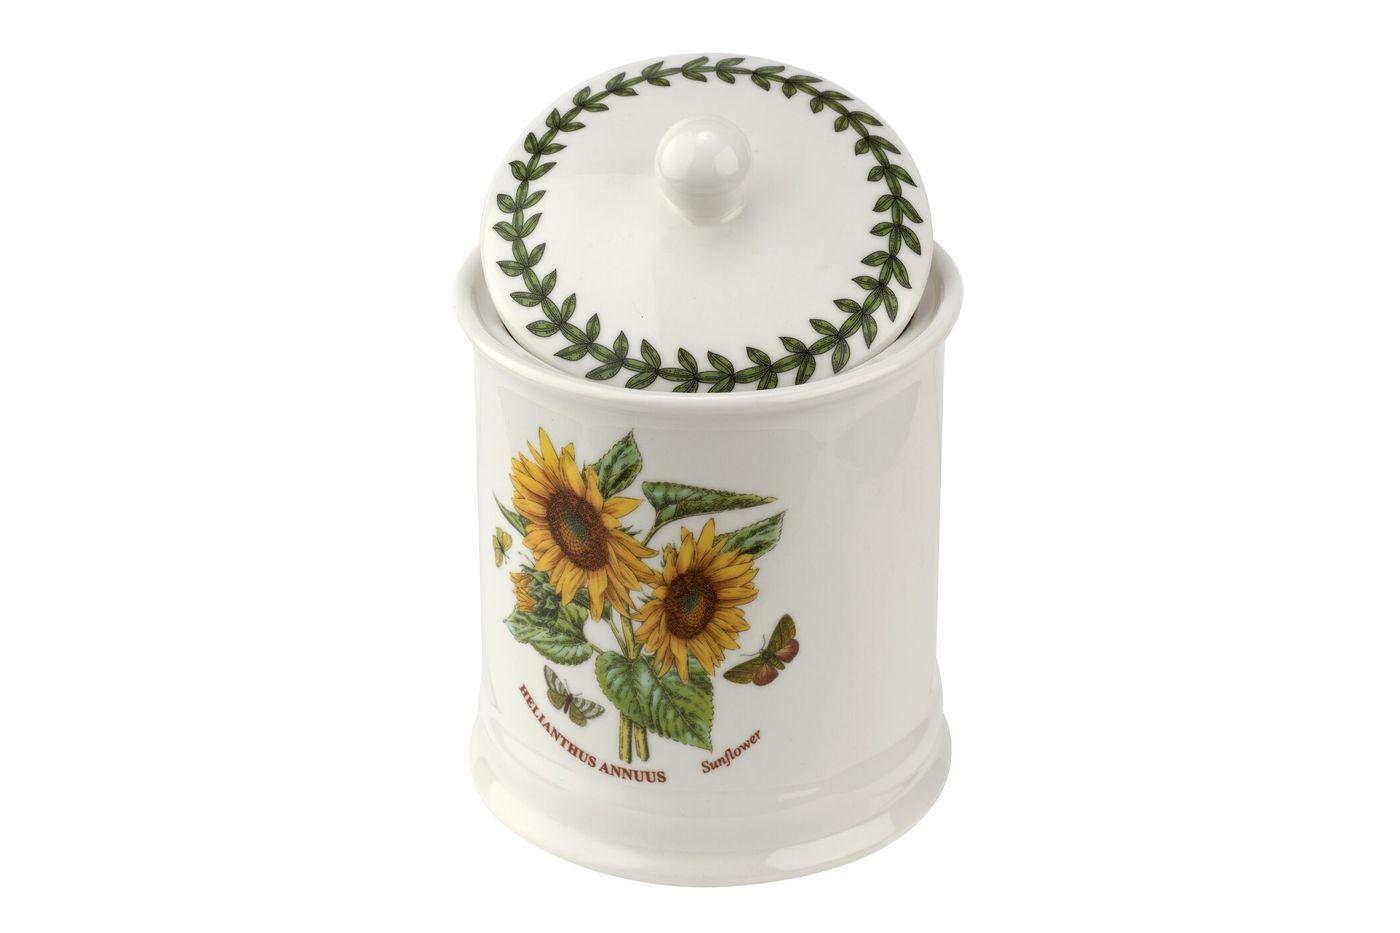 "Portmeirion Botanic Garden Storage Jar + Lid Sunflower 4 x 5 3/4"" thumb 2"